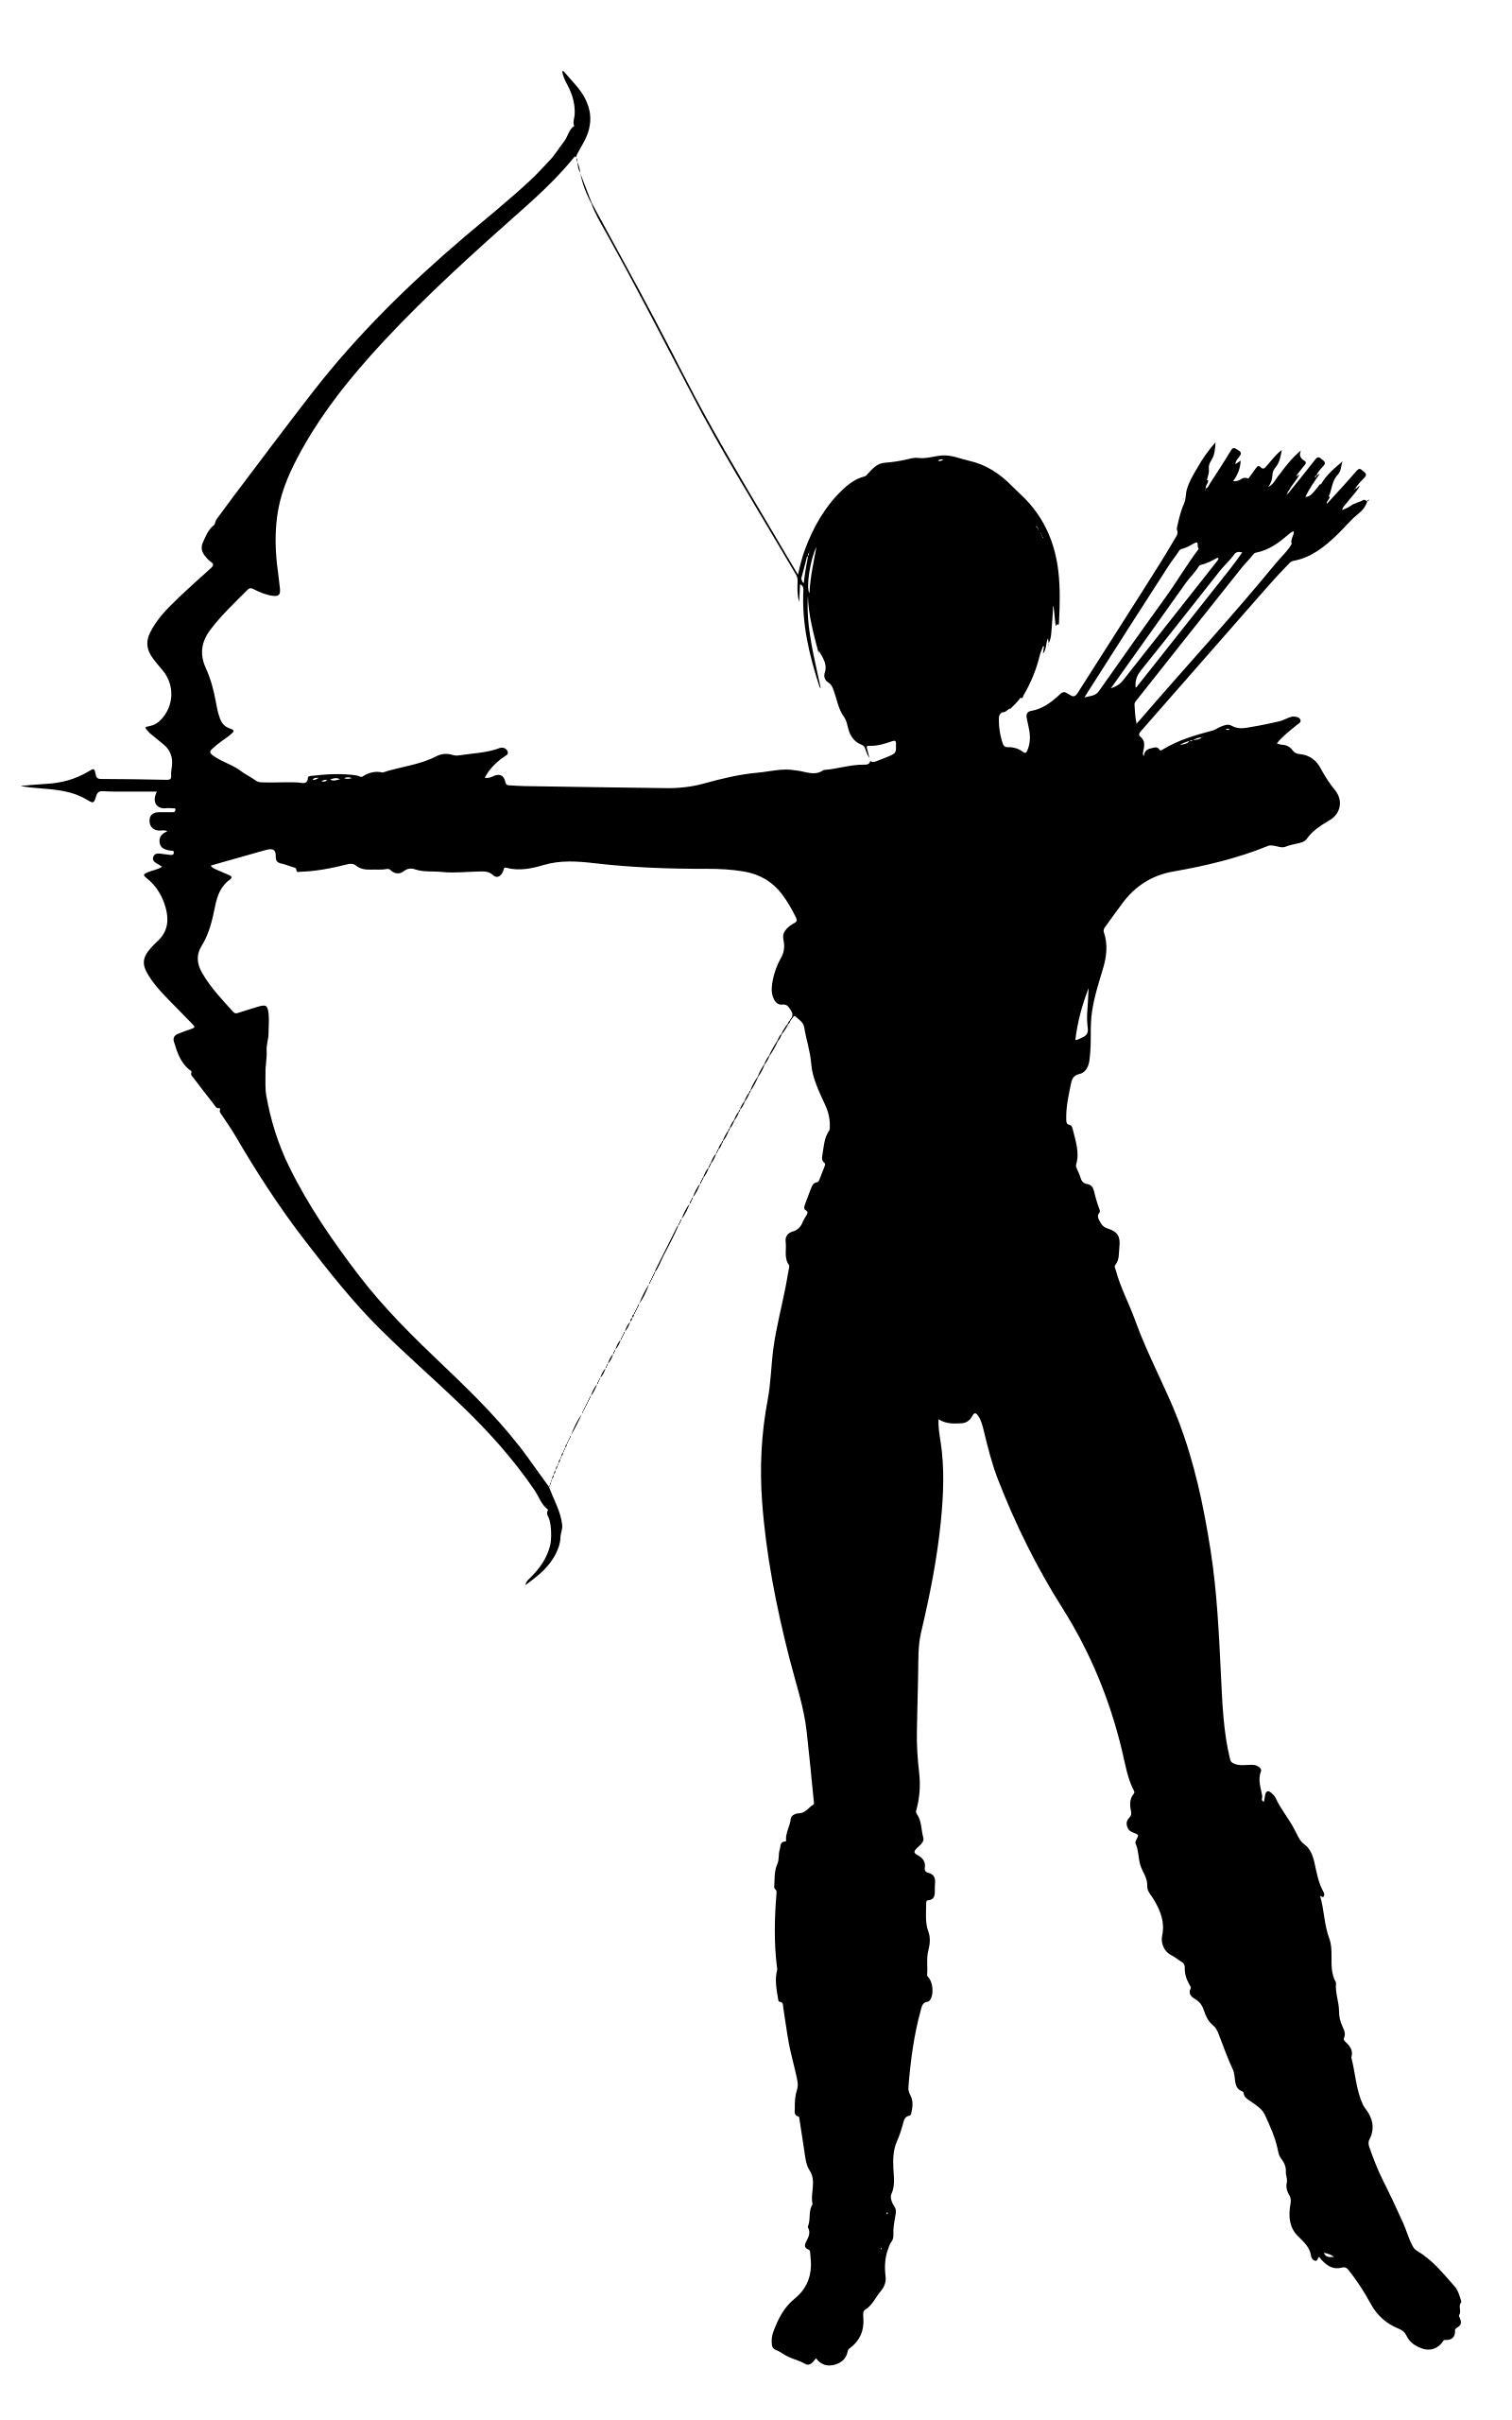 Amazon archer design droide. Archery clipart silhouette